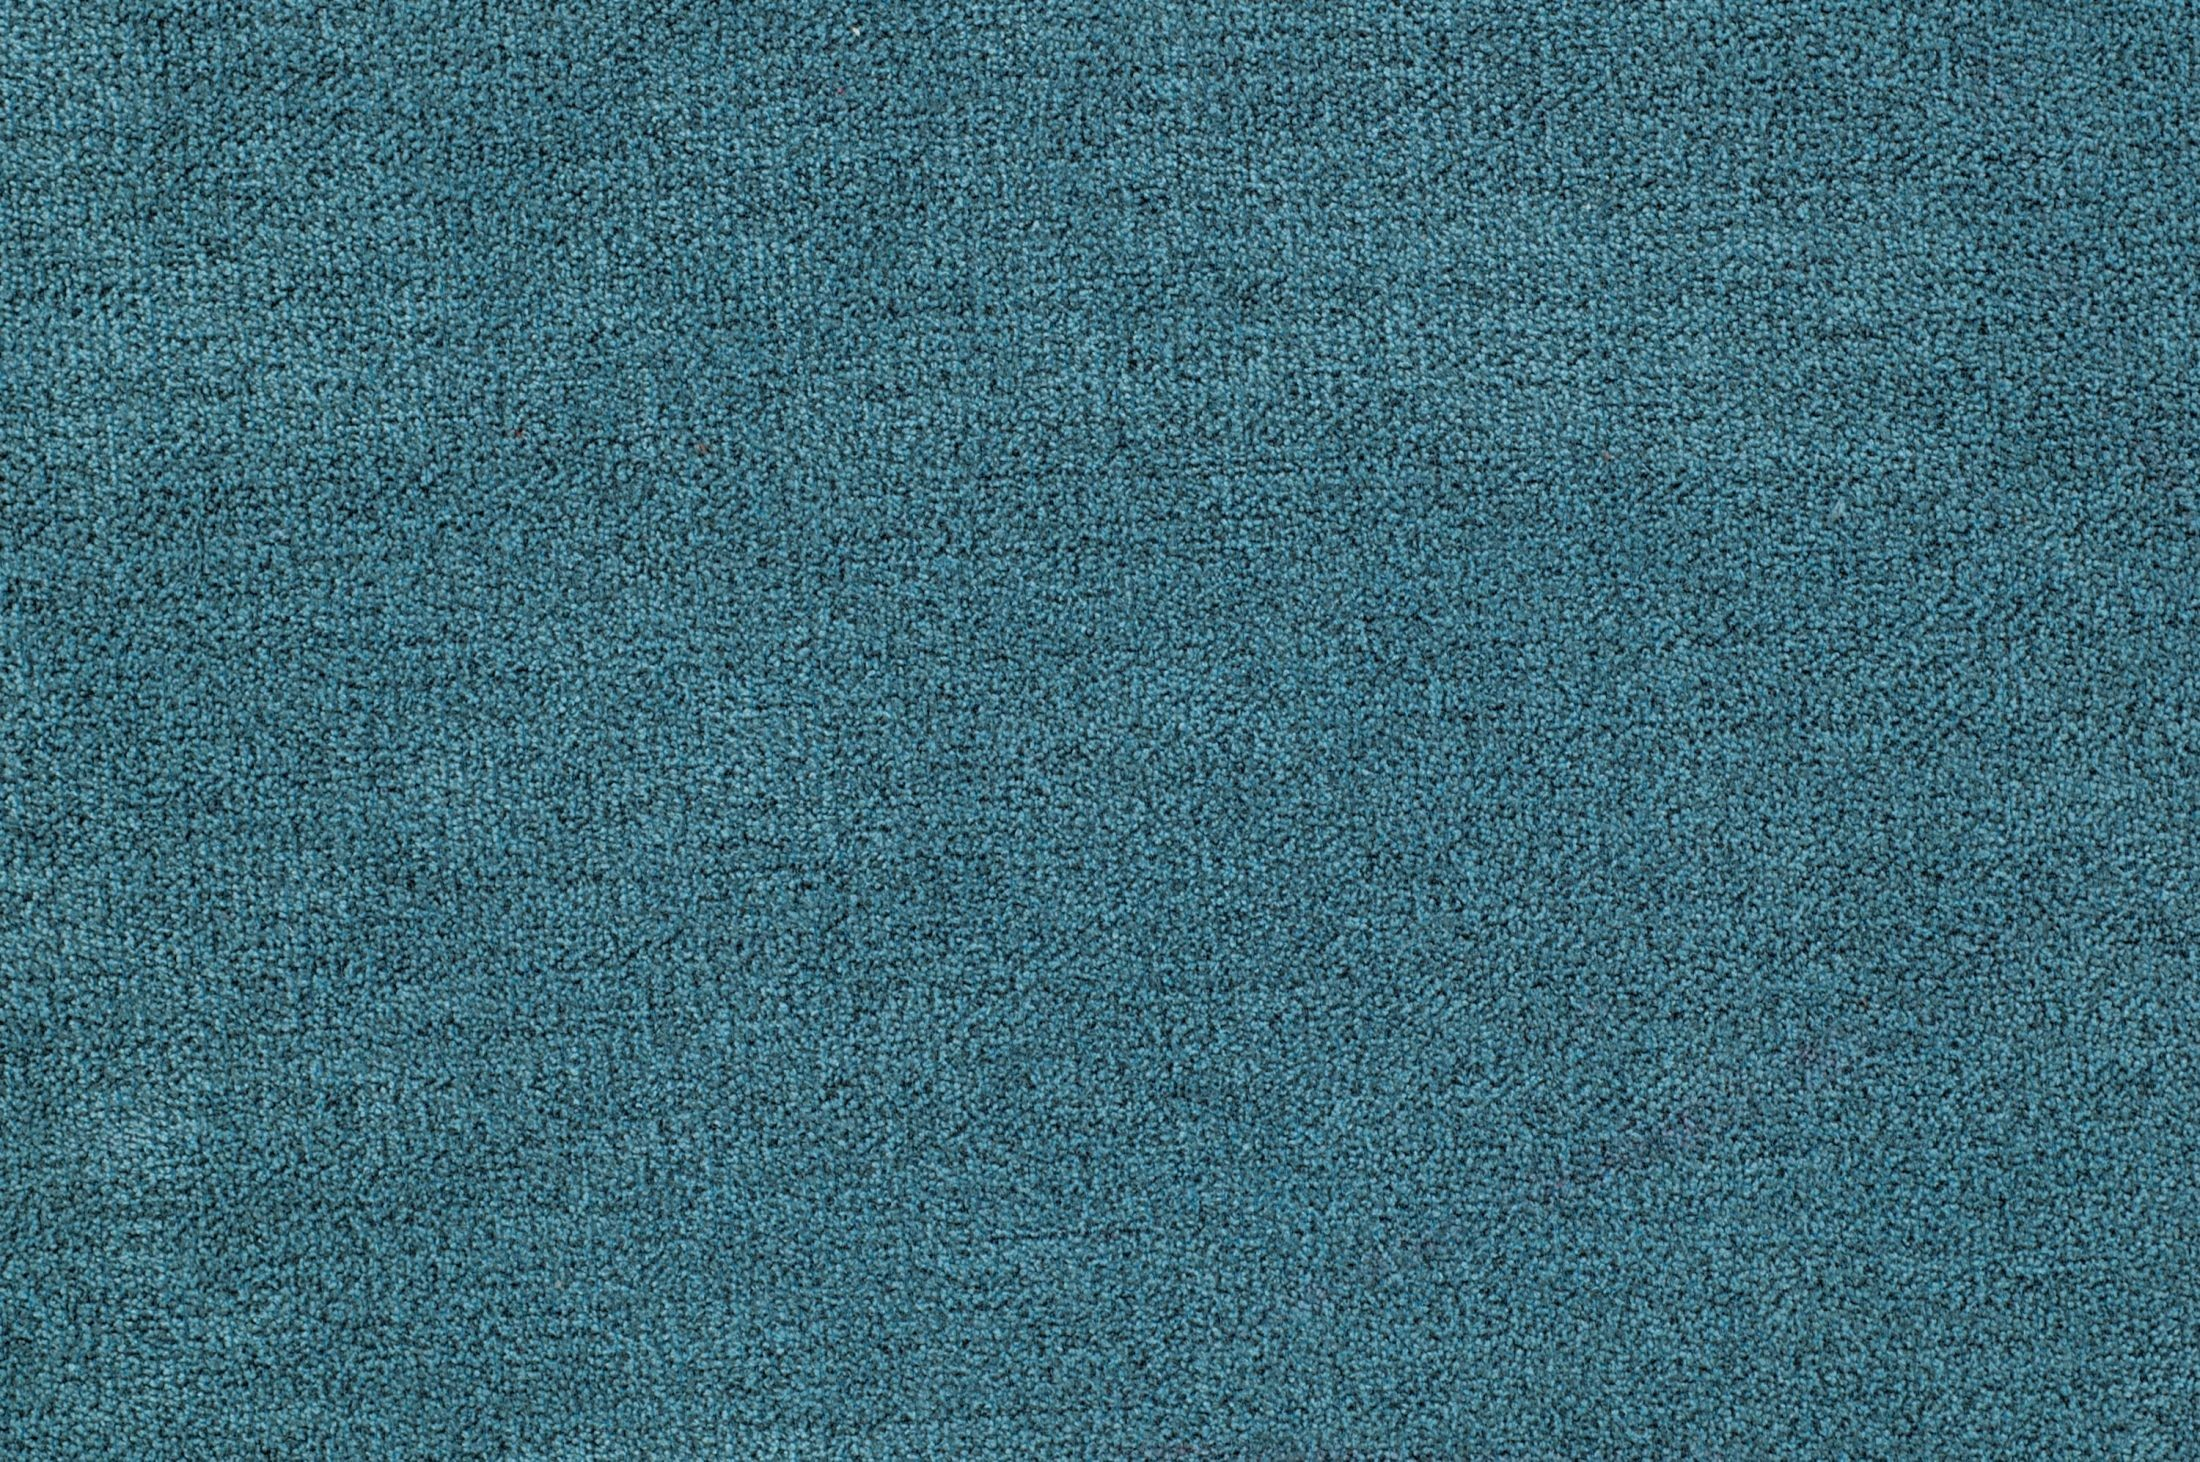 Erath Blue Sofa from Homelegance  Coleman Furniture